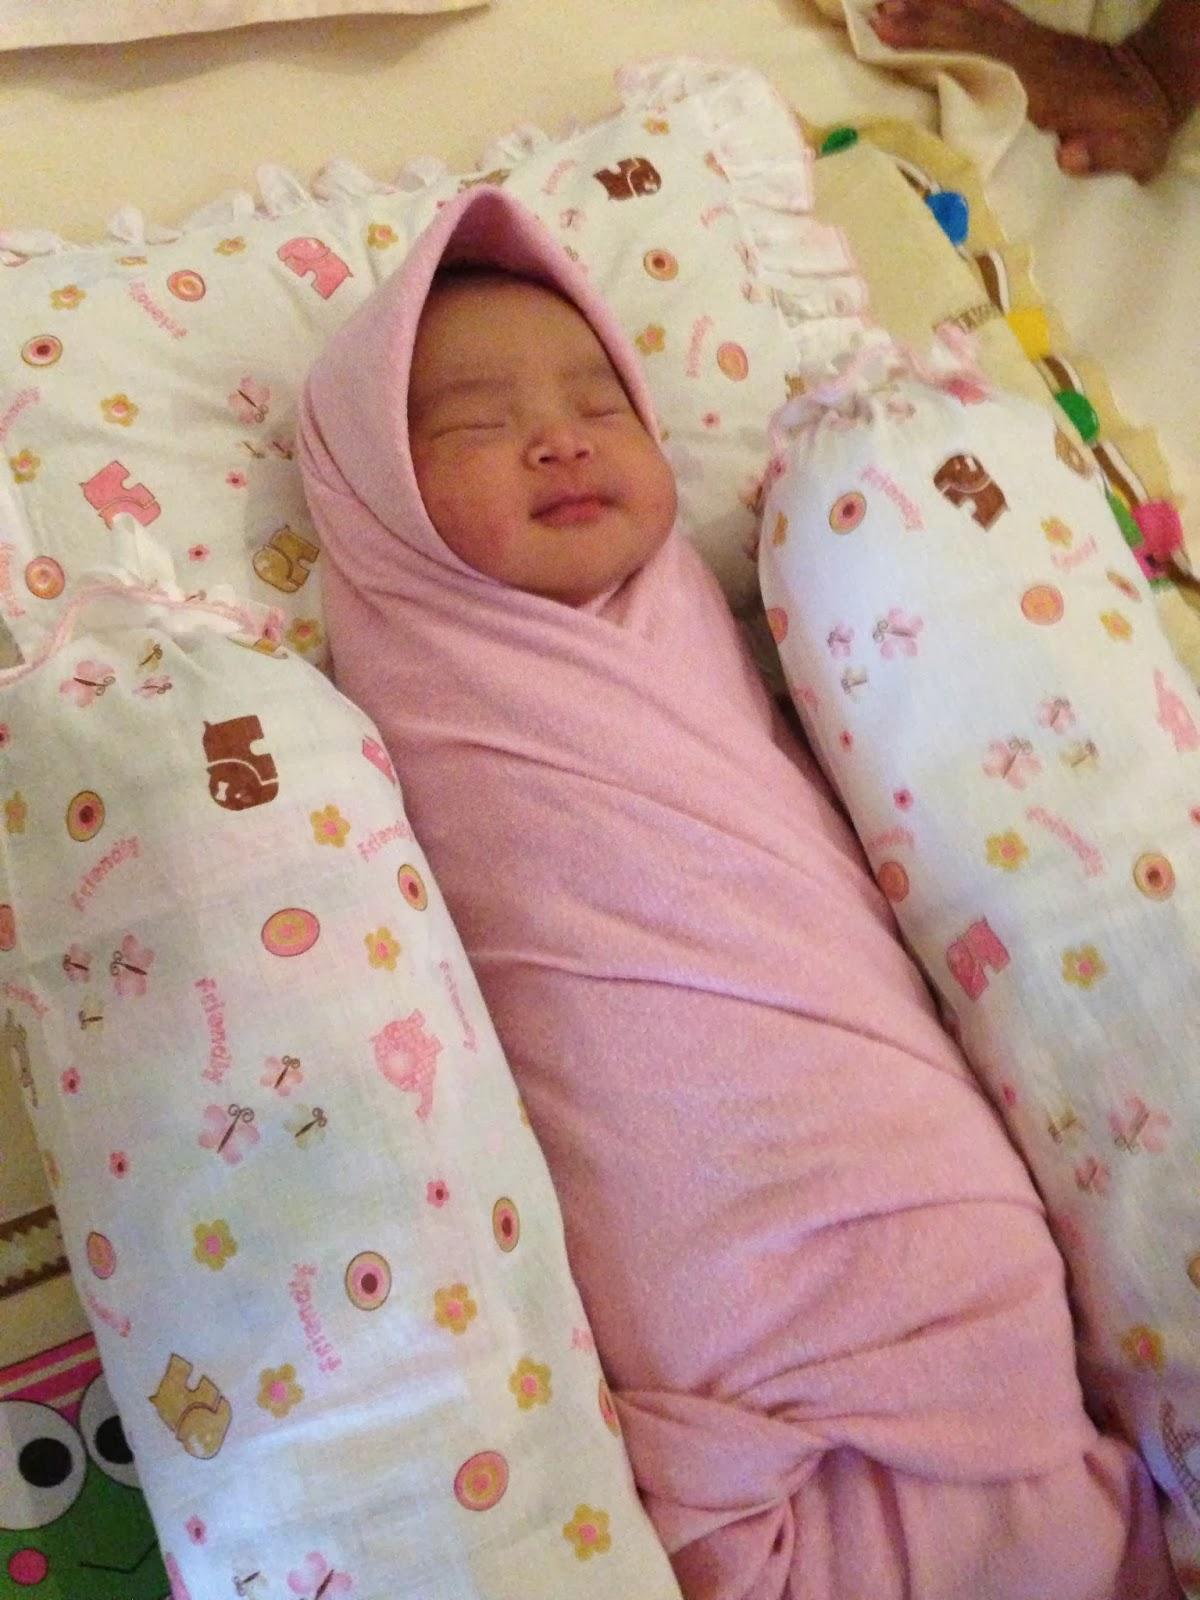 Izmazizima Perlengkapan Bayi Newborn Baru Lahir